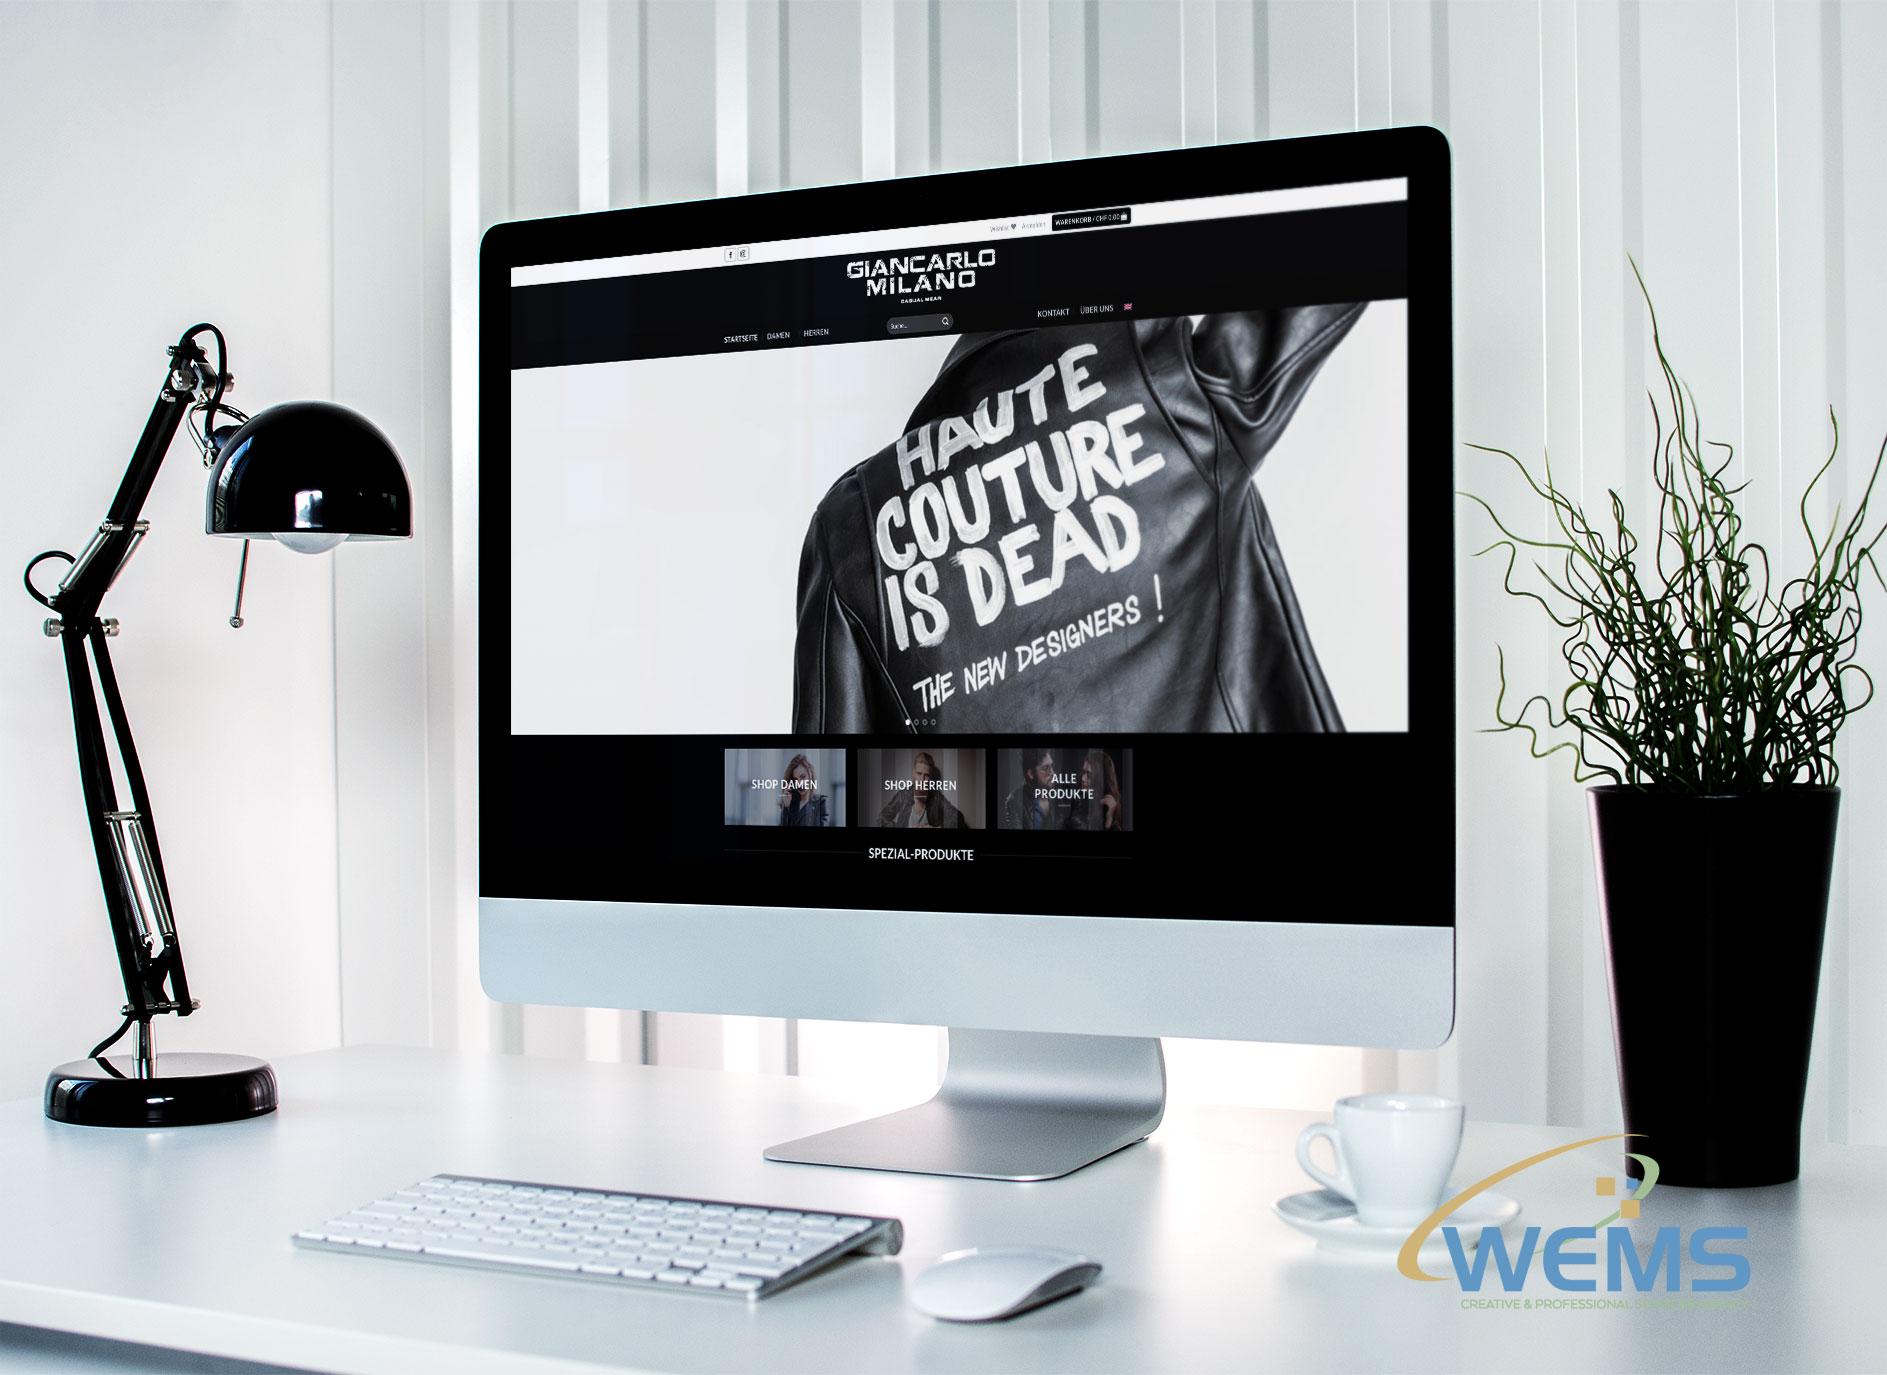 wems agency webdesign mockup Giancarlo Milano Casual Wear   Giancarlo Milano2 - Webdesign und Suchmaschinenoptimierung (SEO) Agentur